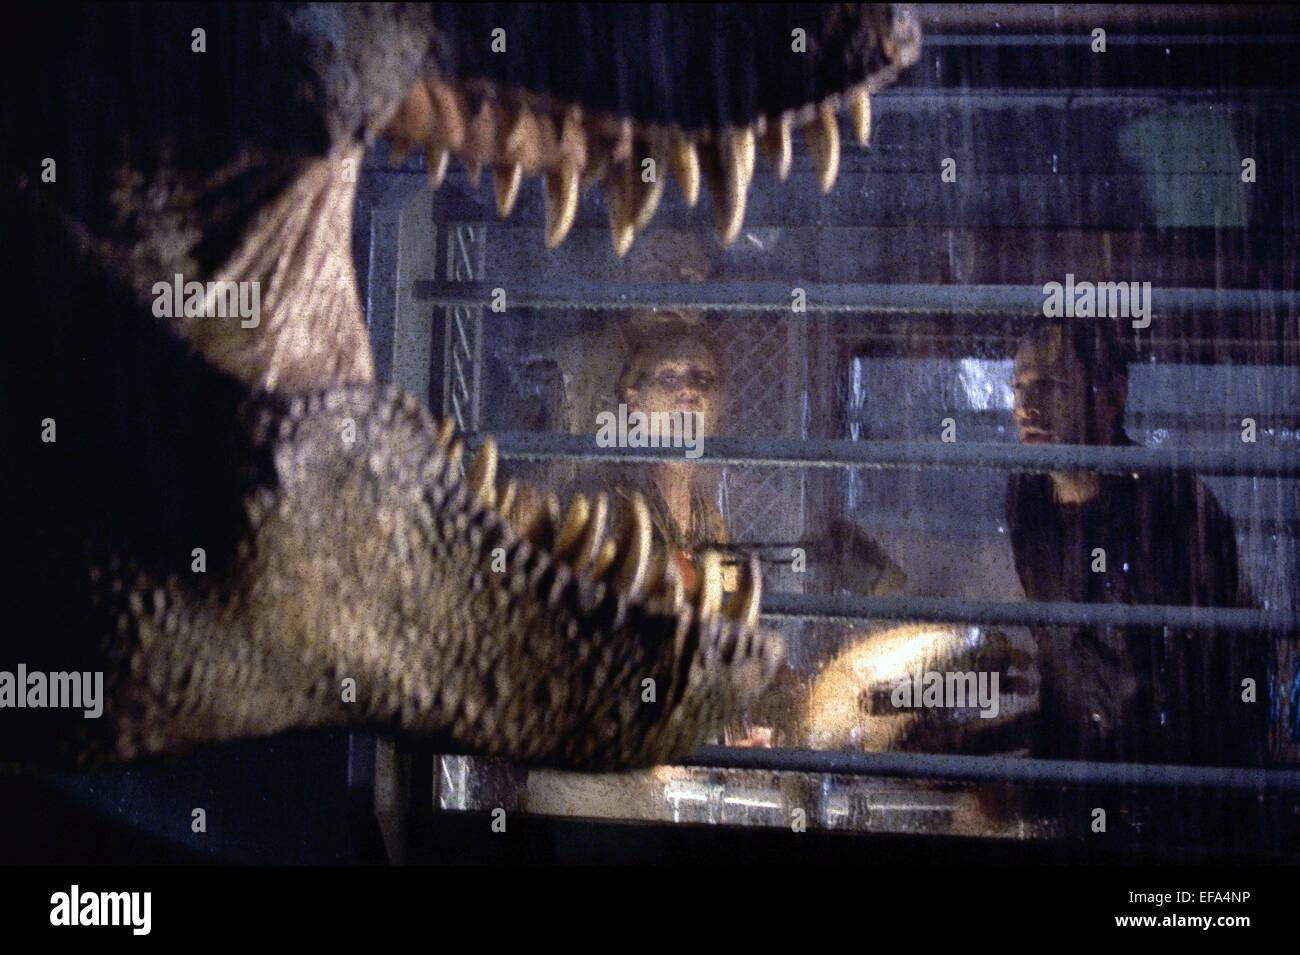 Julianne Moore Jeff Goldblum The Lost World Jurassic Park 1997 Stock Photo Alamy